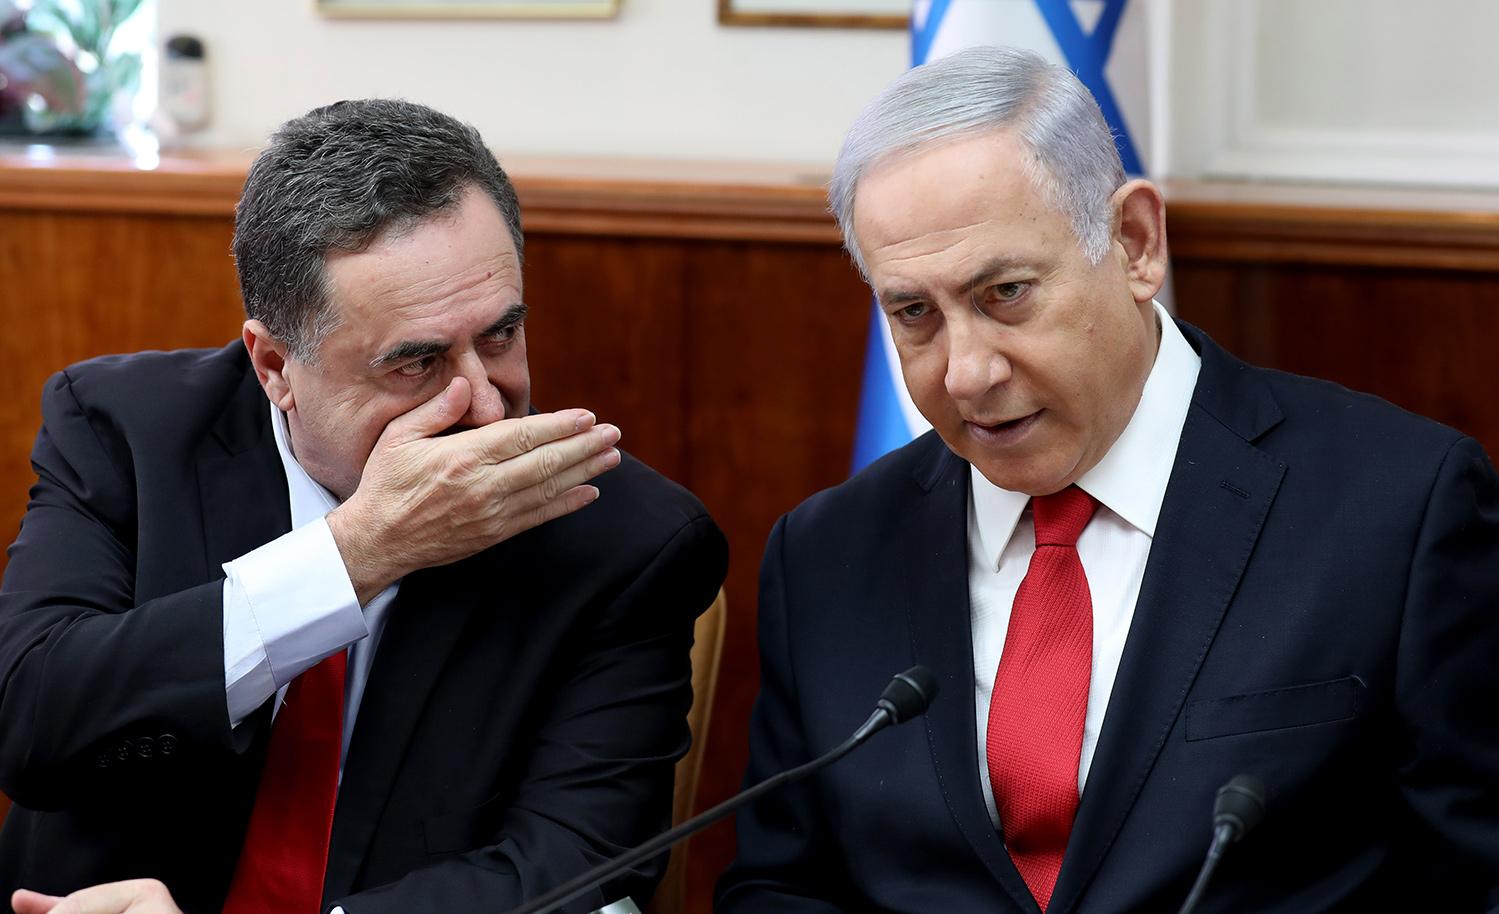 Israeli Finance Minister Israel Katz with Prime Minister Benjamin Netanyahu. GALI TIBBON/POOL/AFP via Getty Images.